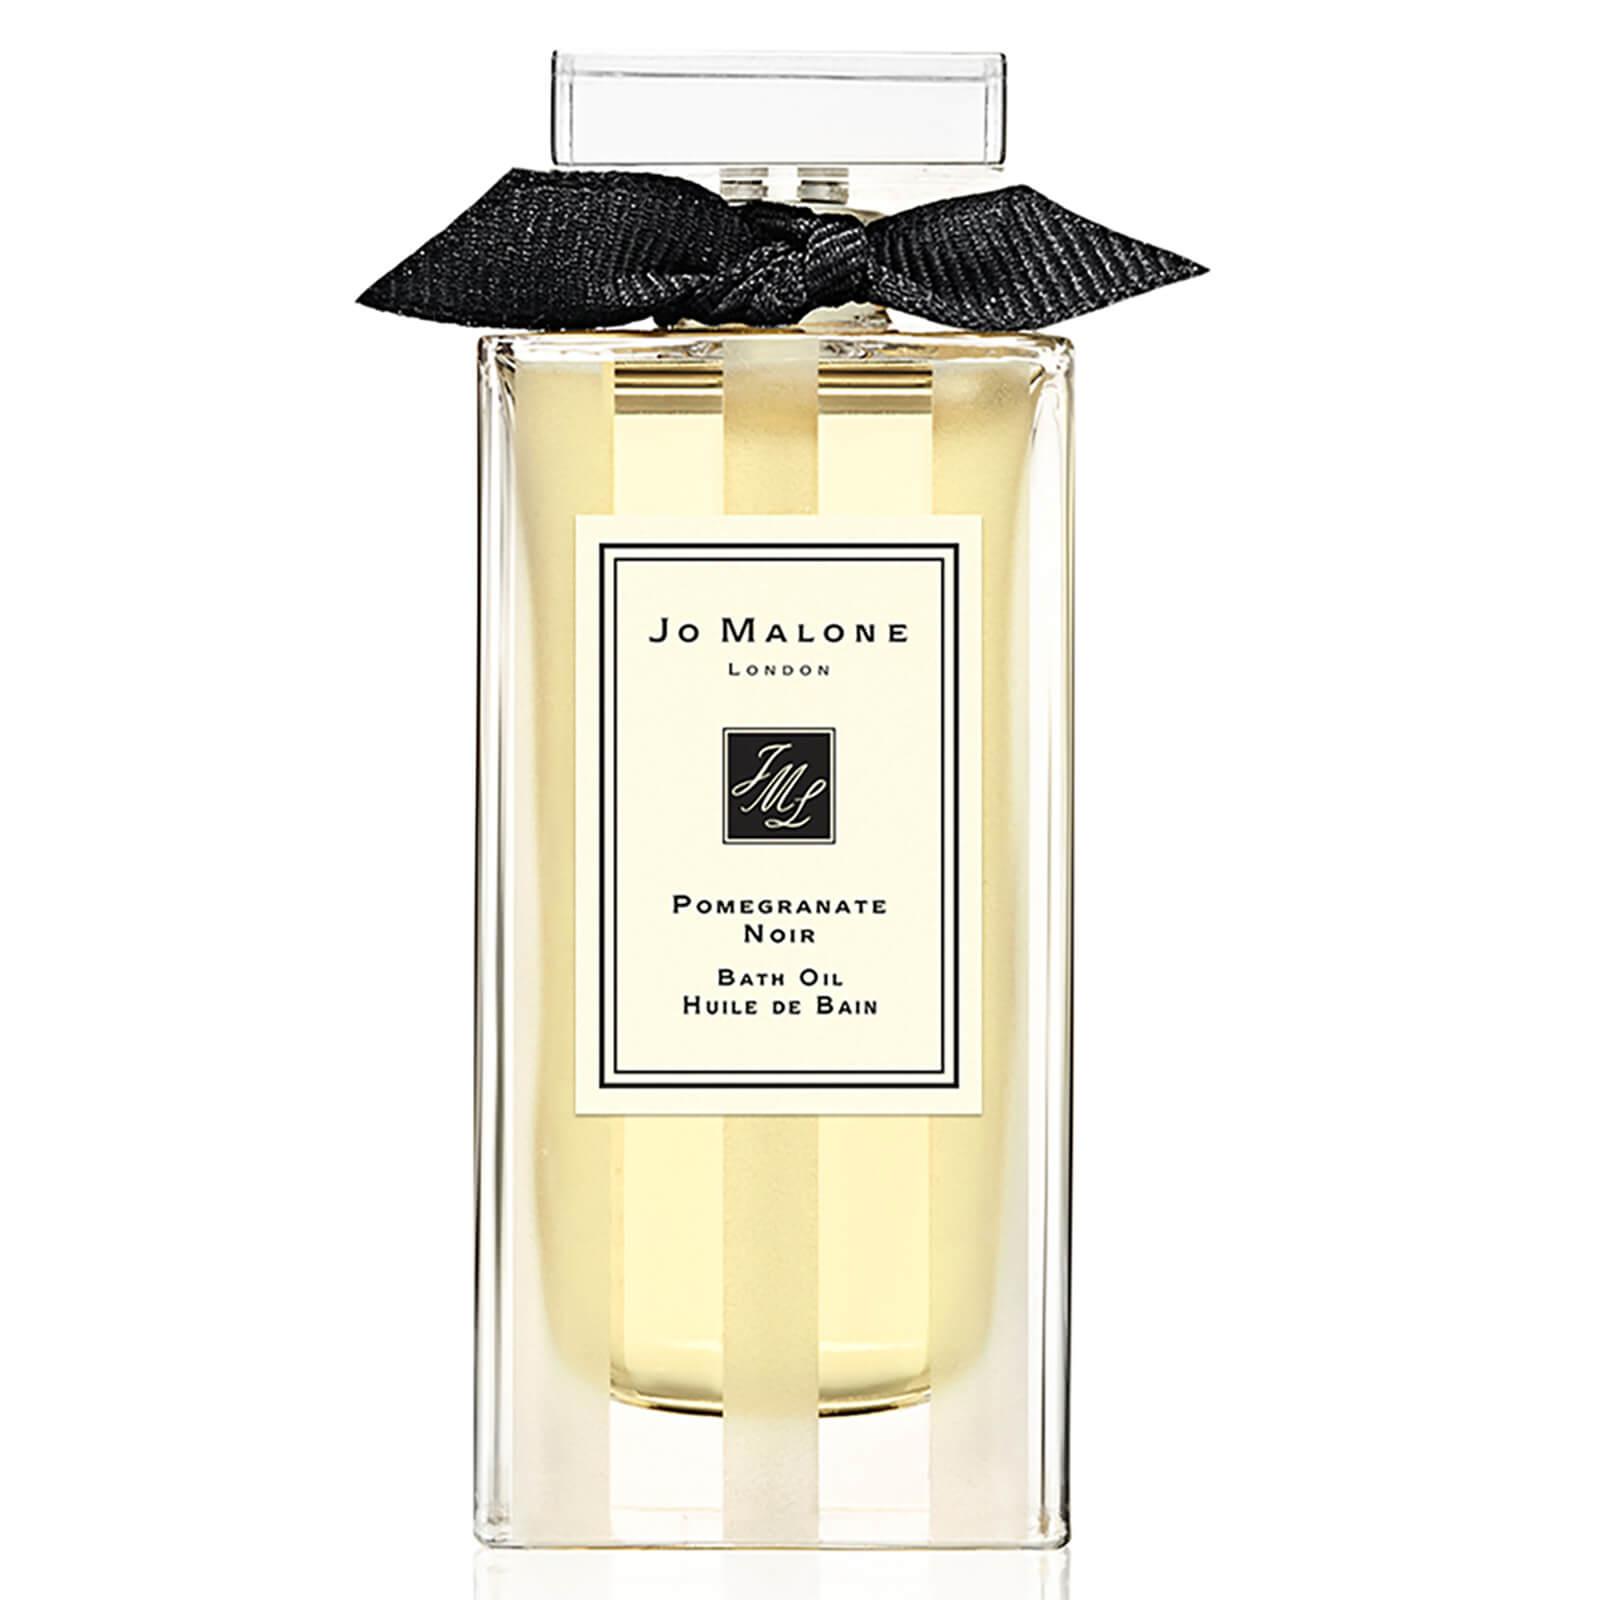 Jo Malone London Pomegranate Noir Bath Oil (Various Sizes) - 30ml